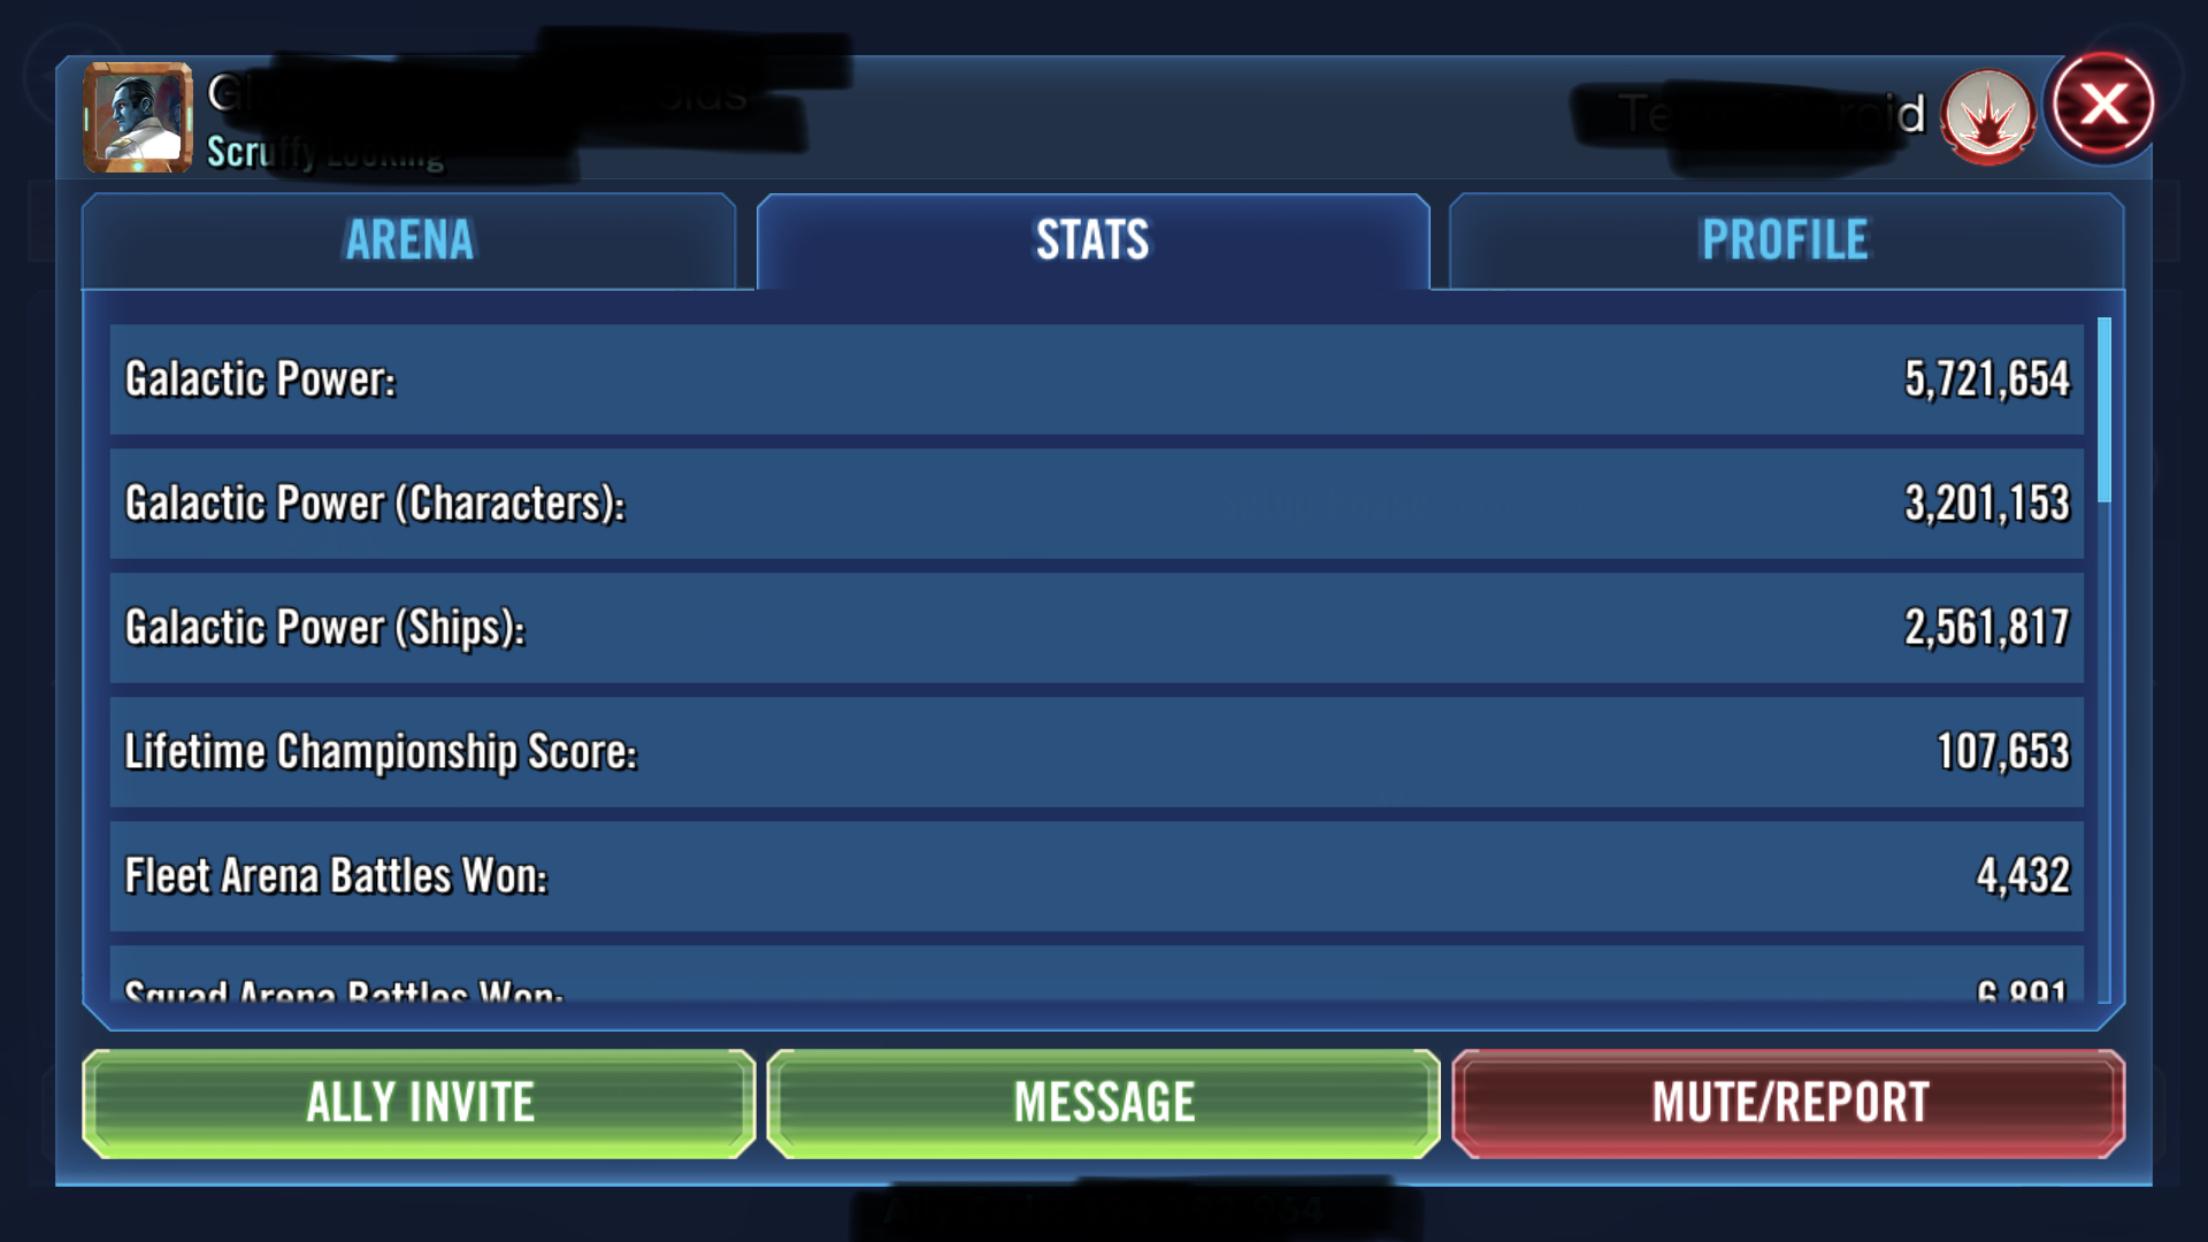 Come funziona lArena matchmaking